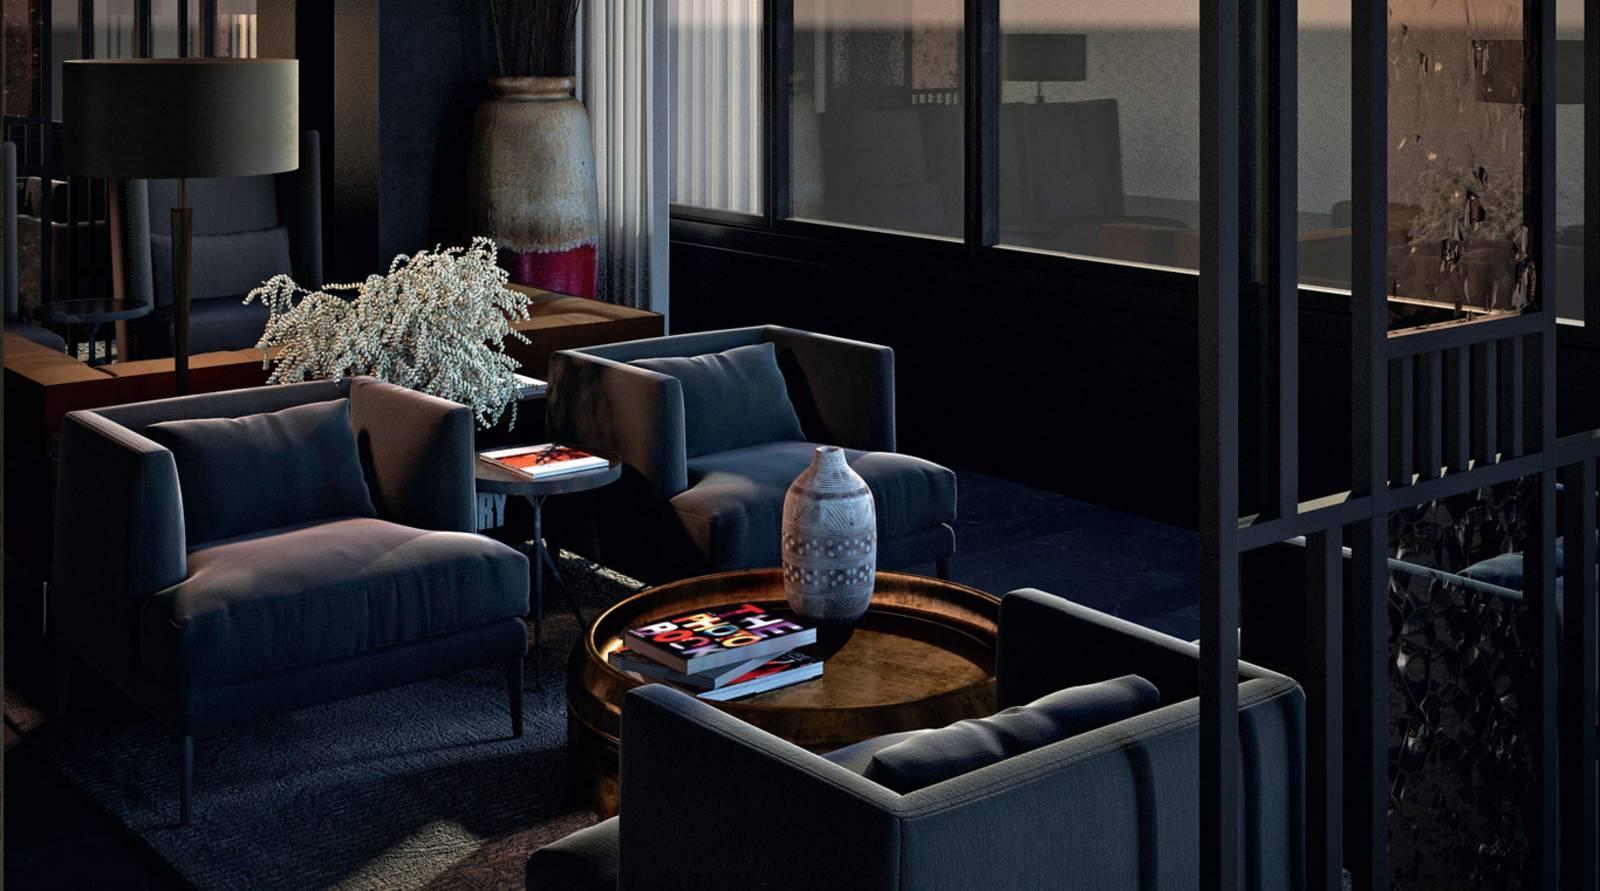 The Ritz Carlton Residences Nişantaşı